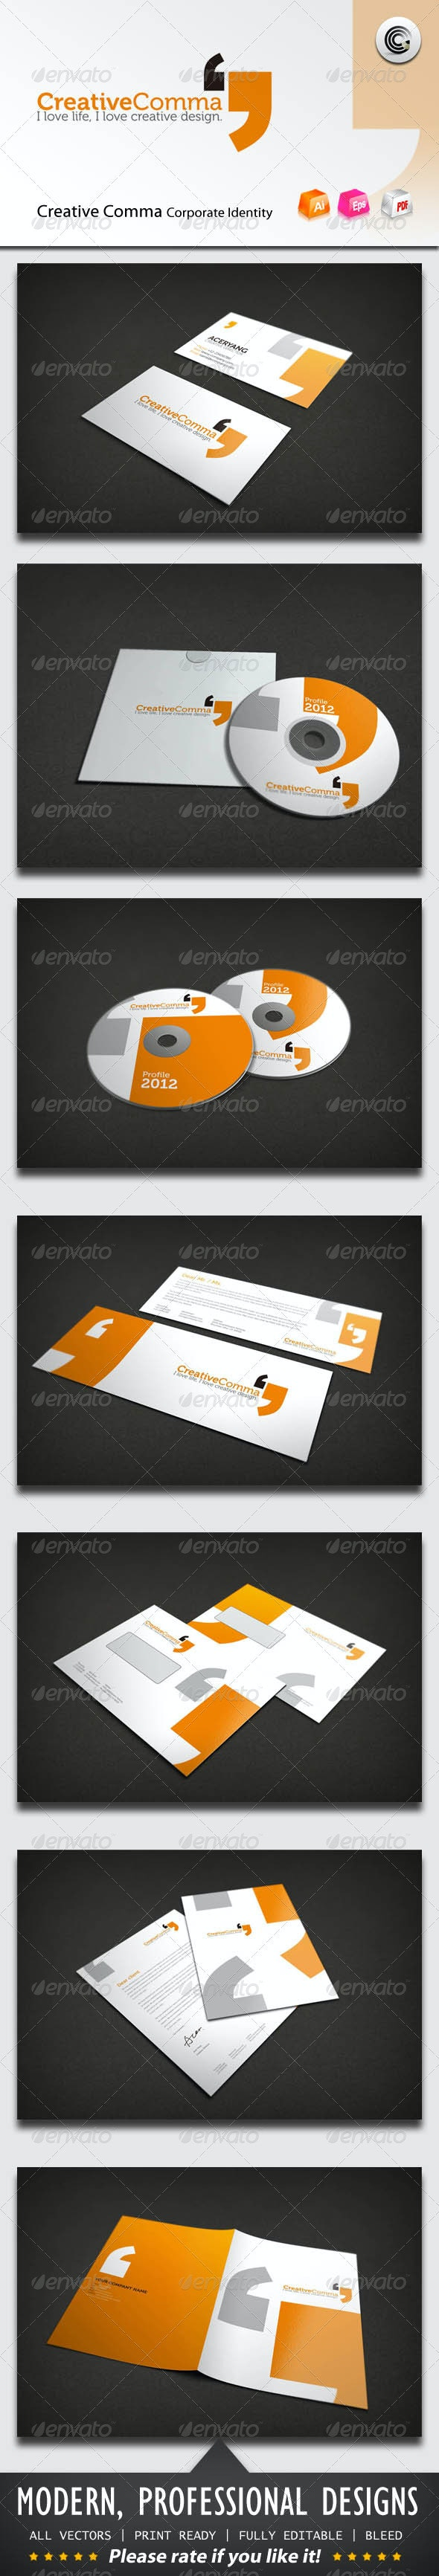 Creative Comma Corporate Identity - Stationery Print Templates